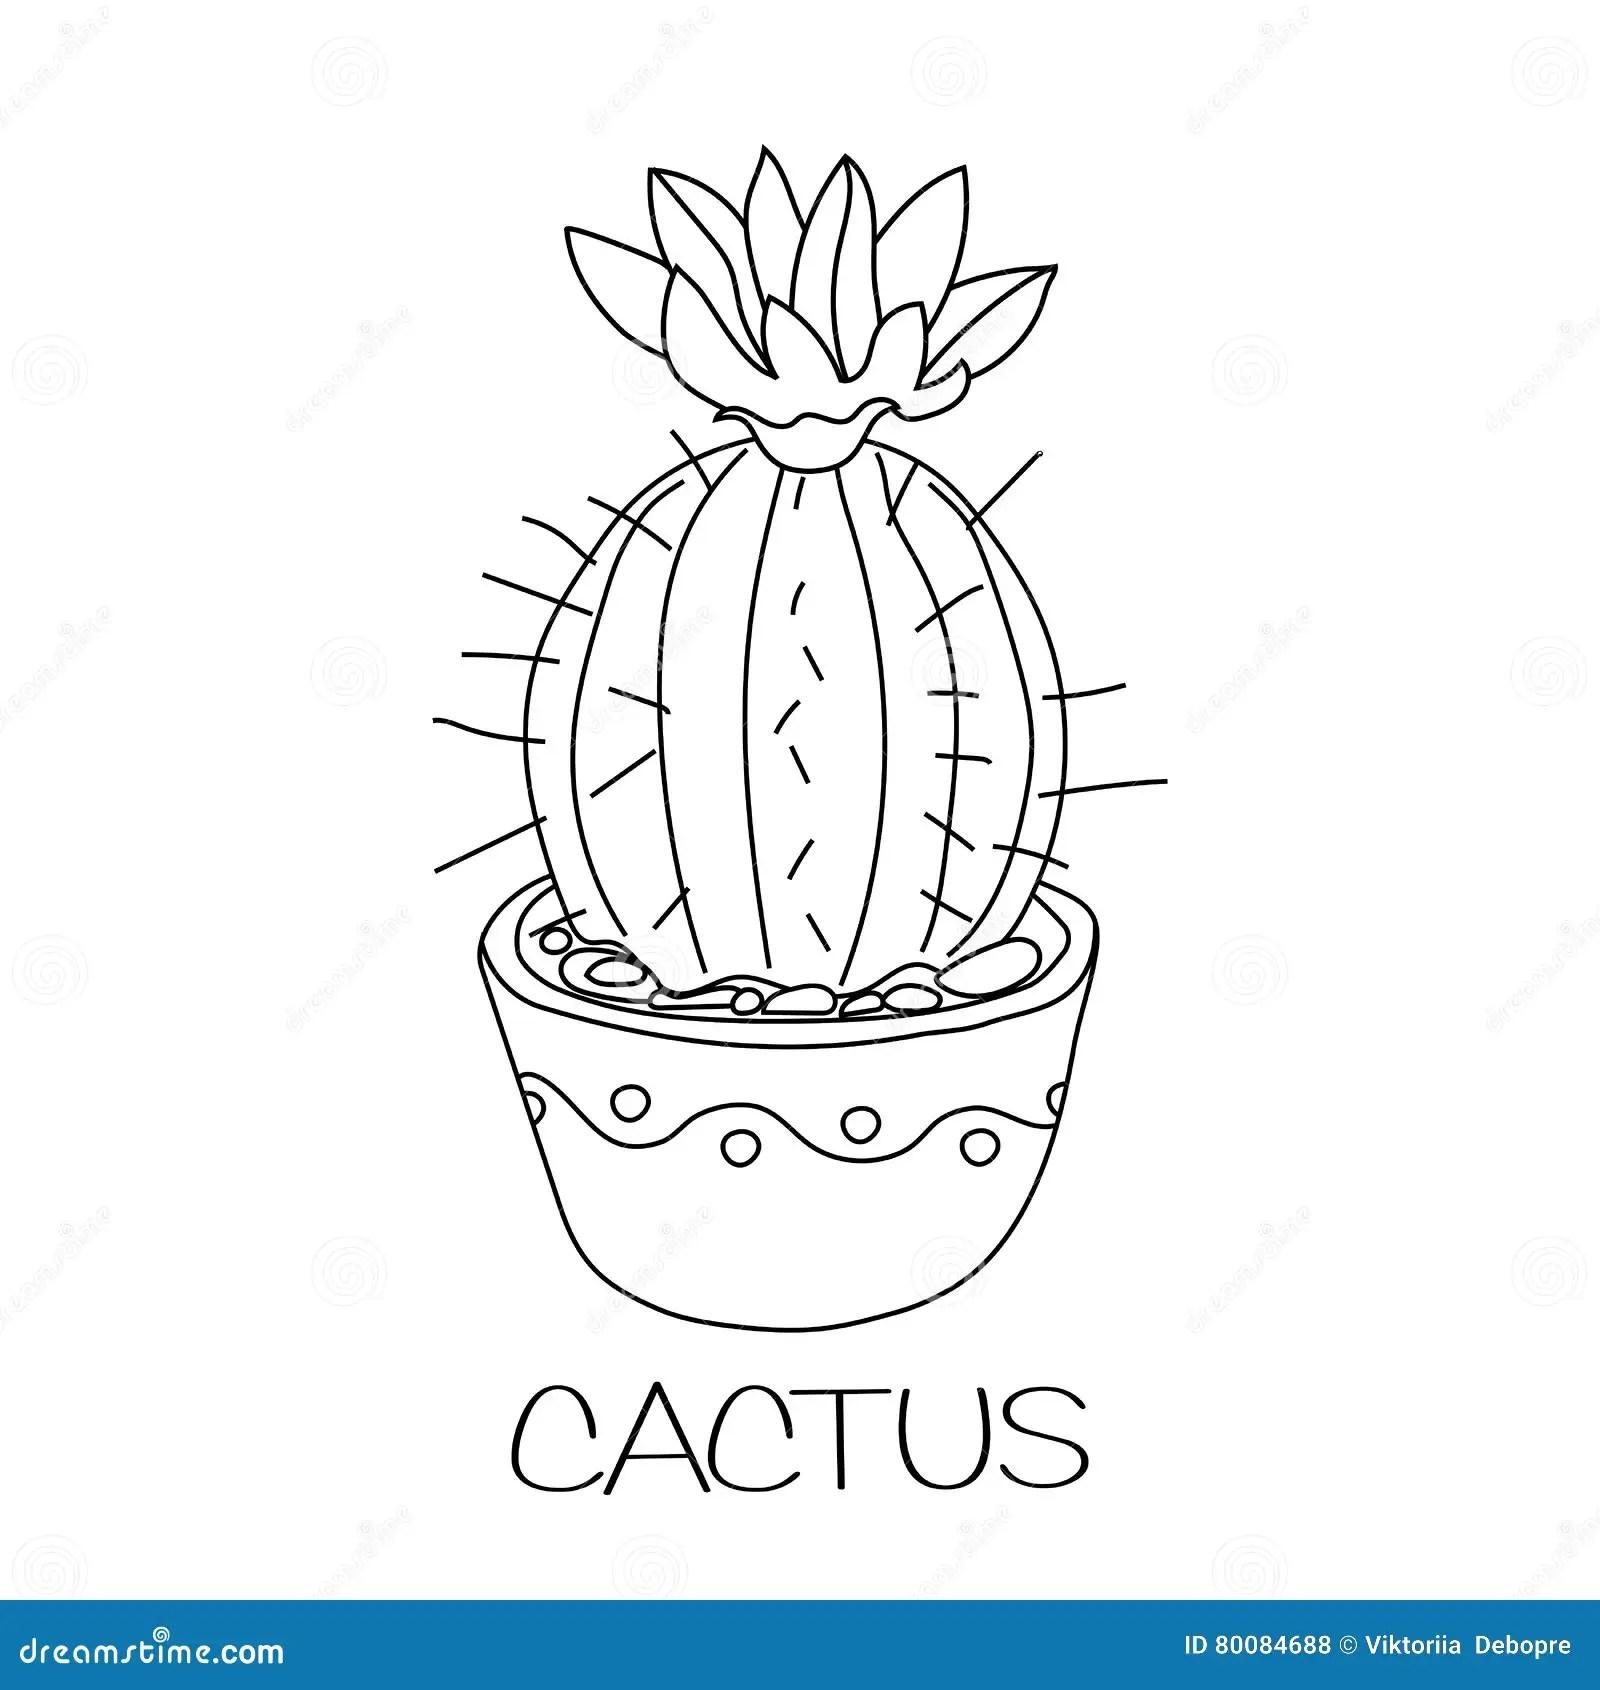 Prickly Pear Cactus Coloring Page